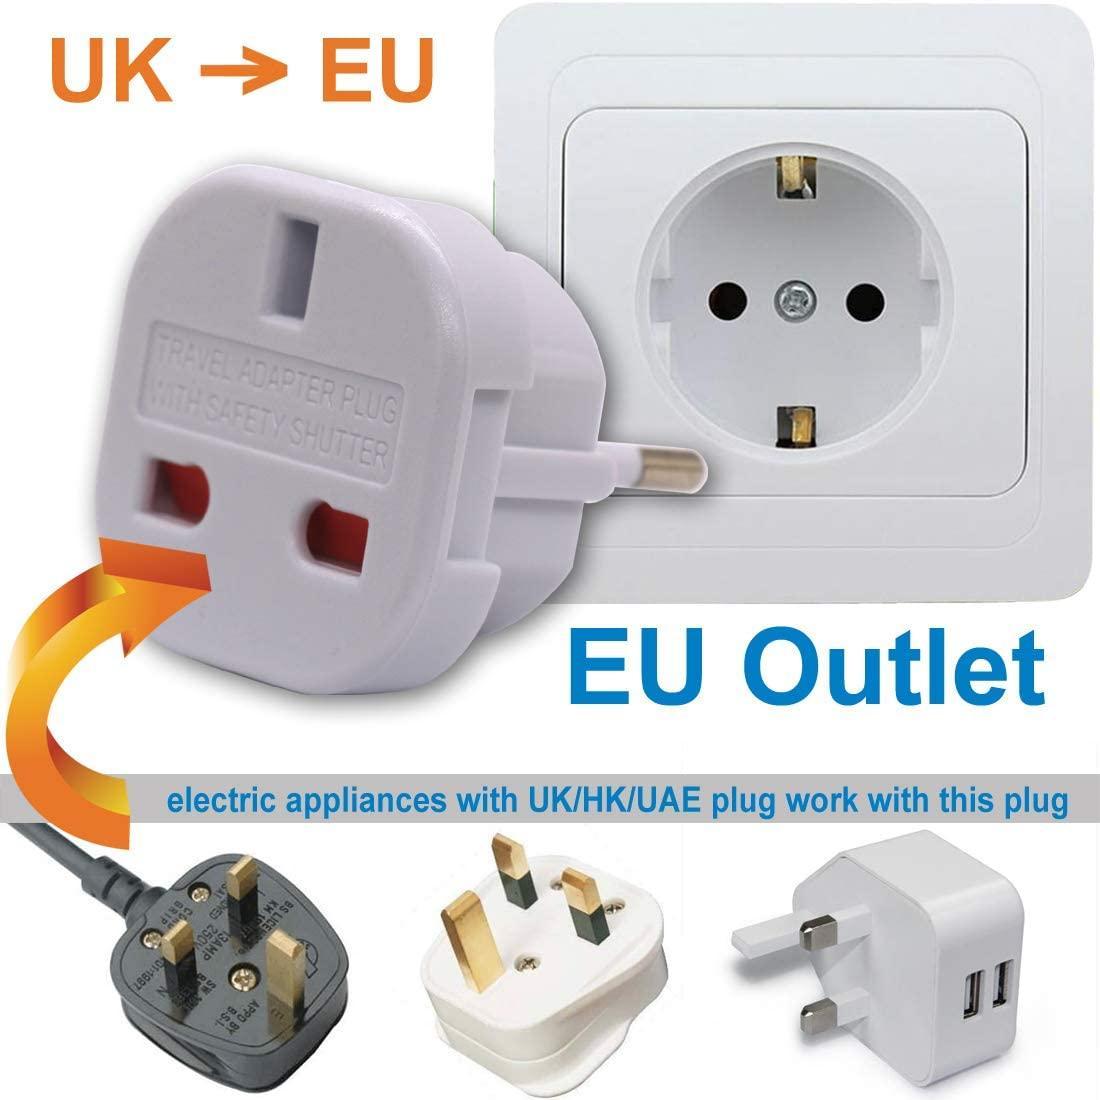 Travel Adaptor for UAE/UK Convert to EU Type C Socket (NOT E/F plug) with Safety Shutter , UK to EU plug)